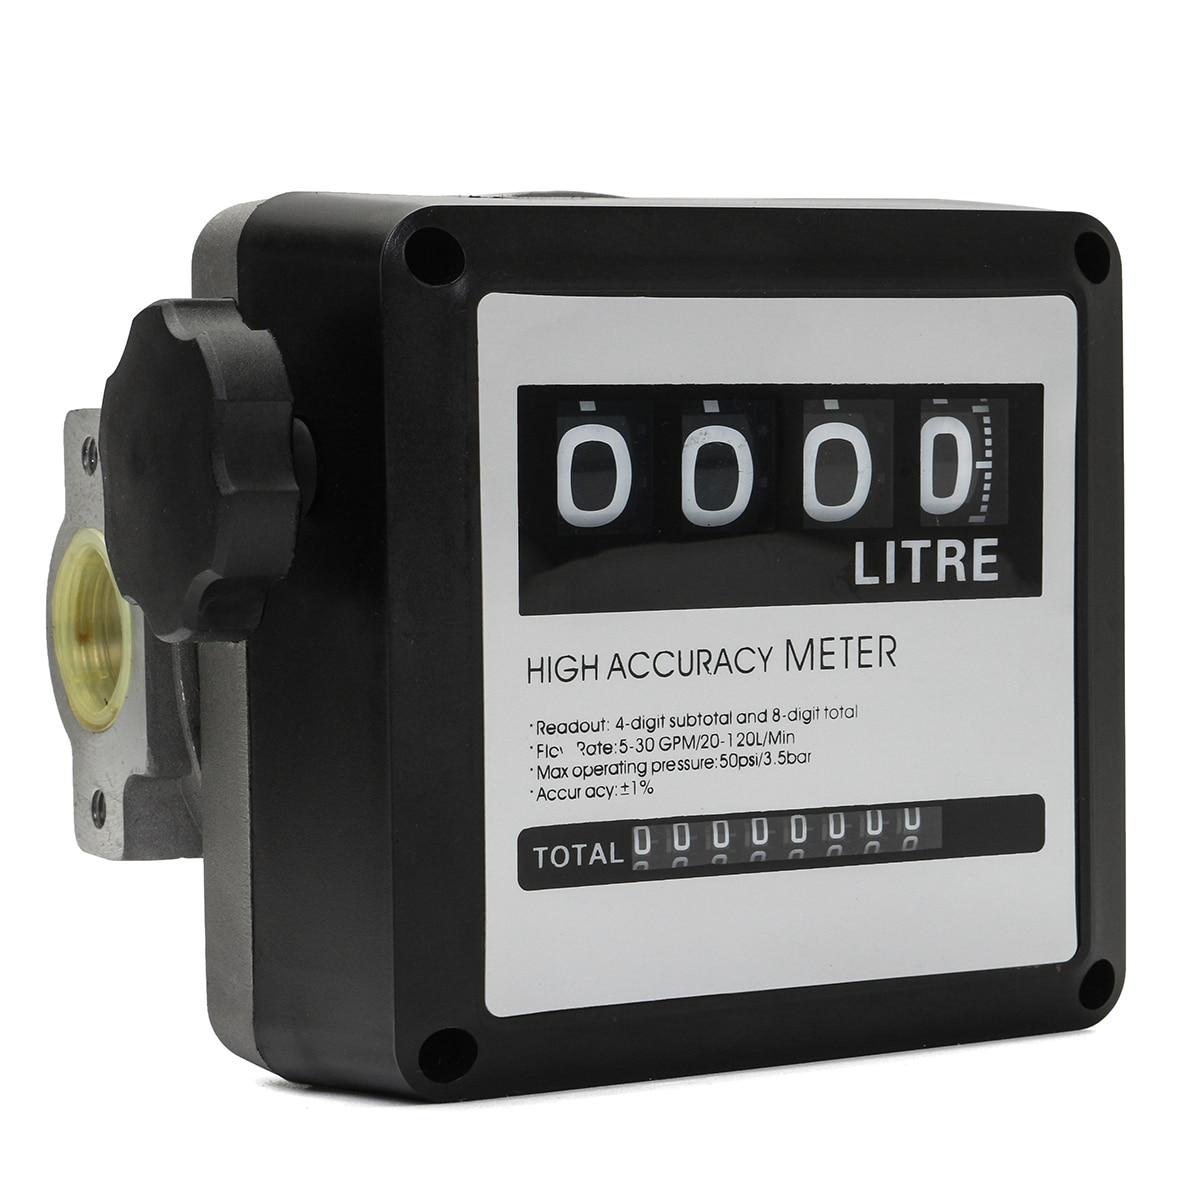 1Pcs FM 120 4 Digital Gasoline Fuel Petrol Oil Flow Meter 20 120L/Min Four Digital for Diesel Fuel Oil Flow Meter Counter